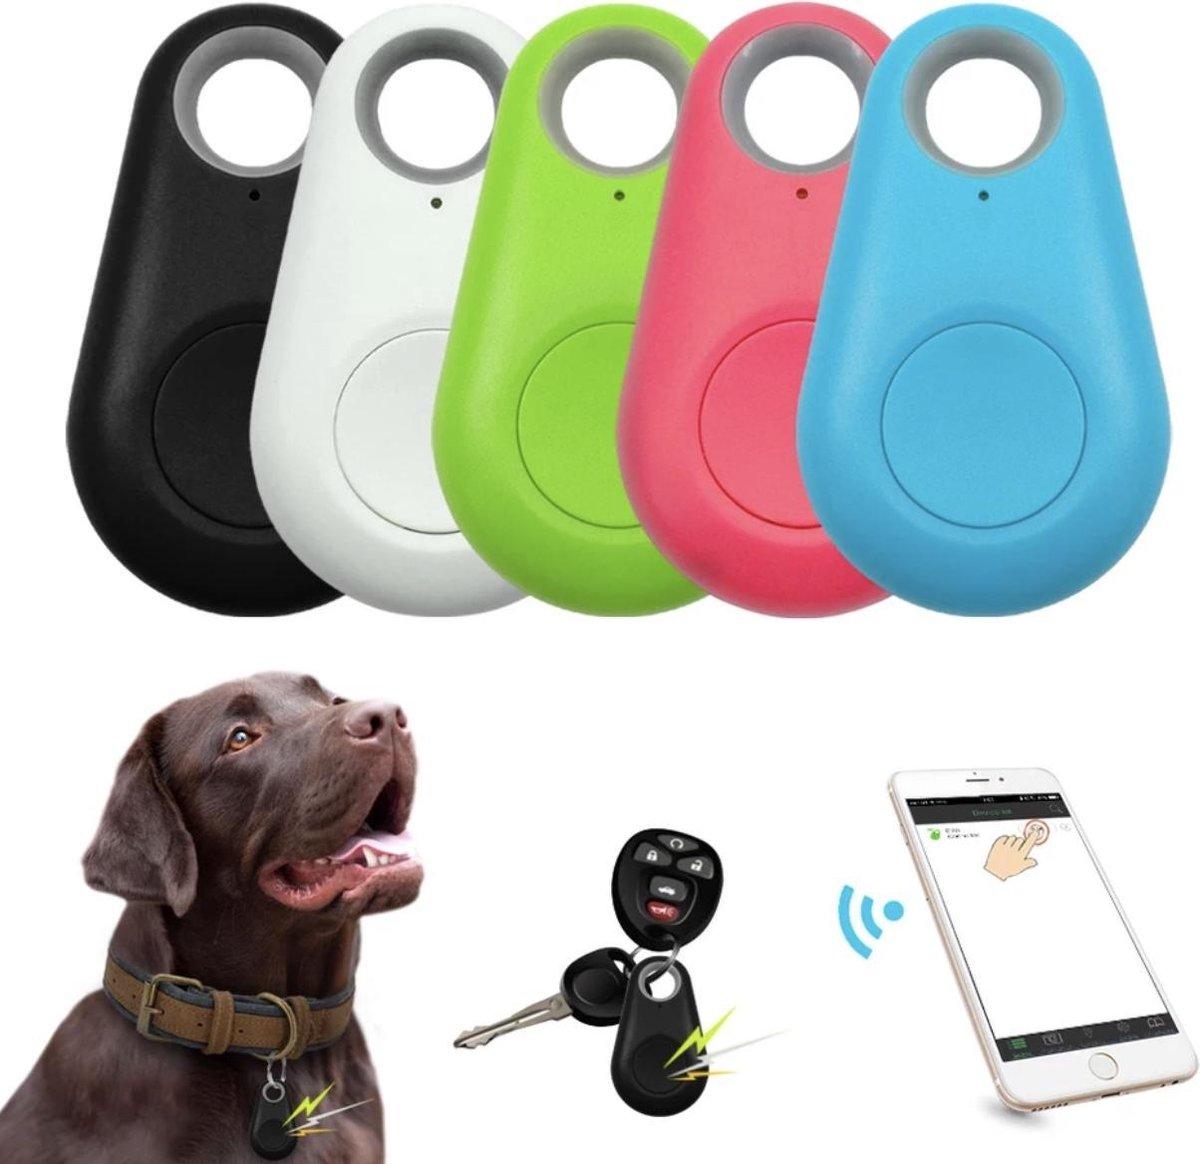 Bluetooth GPS Tracker - GPS Tracer Met Voicerecorder - Sleutelhanger Tracking Volg Systeem Voor Kind / Hond / Kat / Baggage Inclusief Alarmfunctie / sleutels vinder / zilver